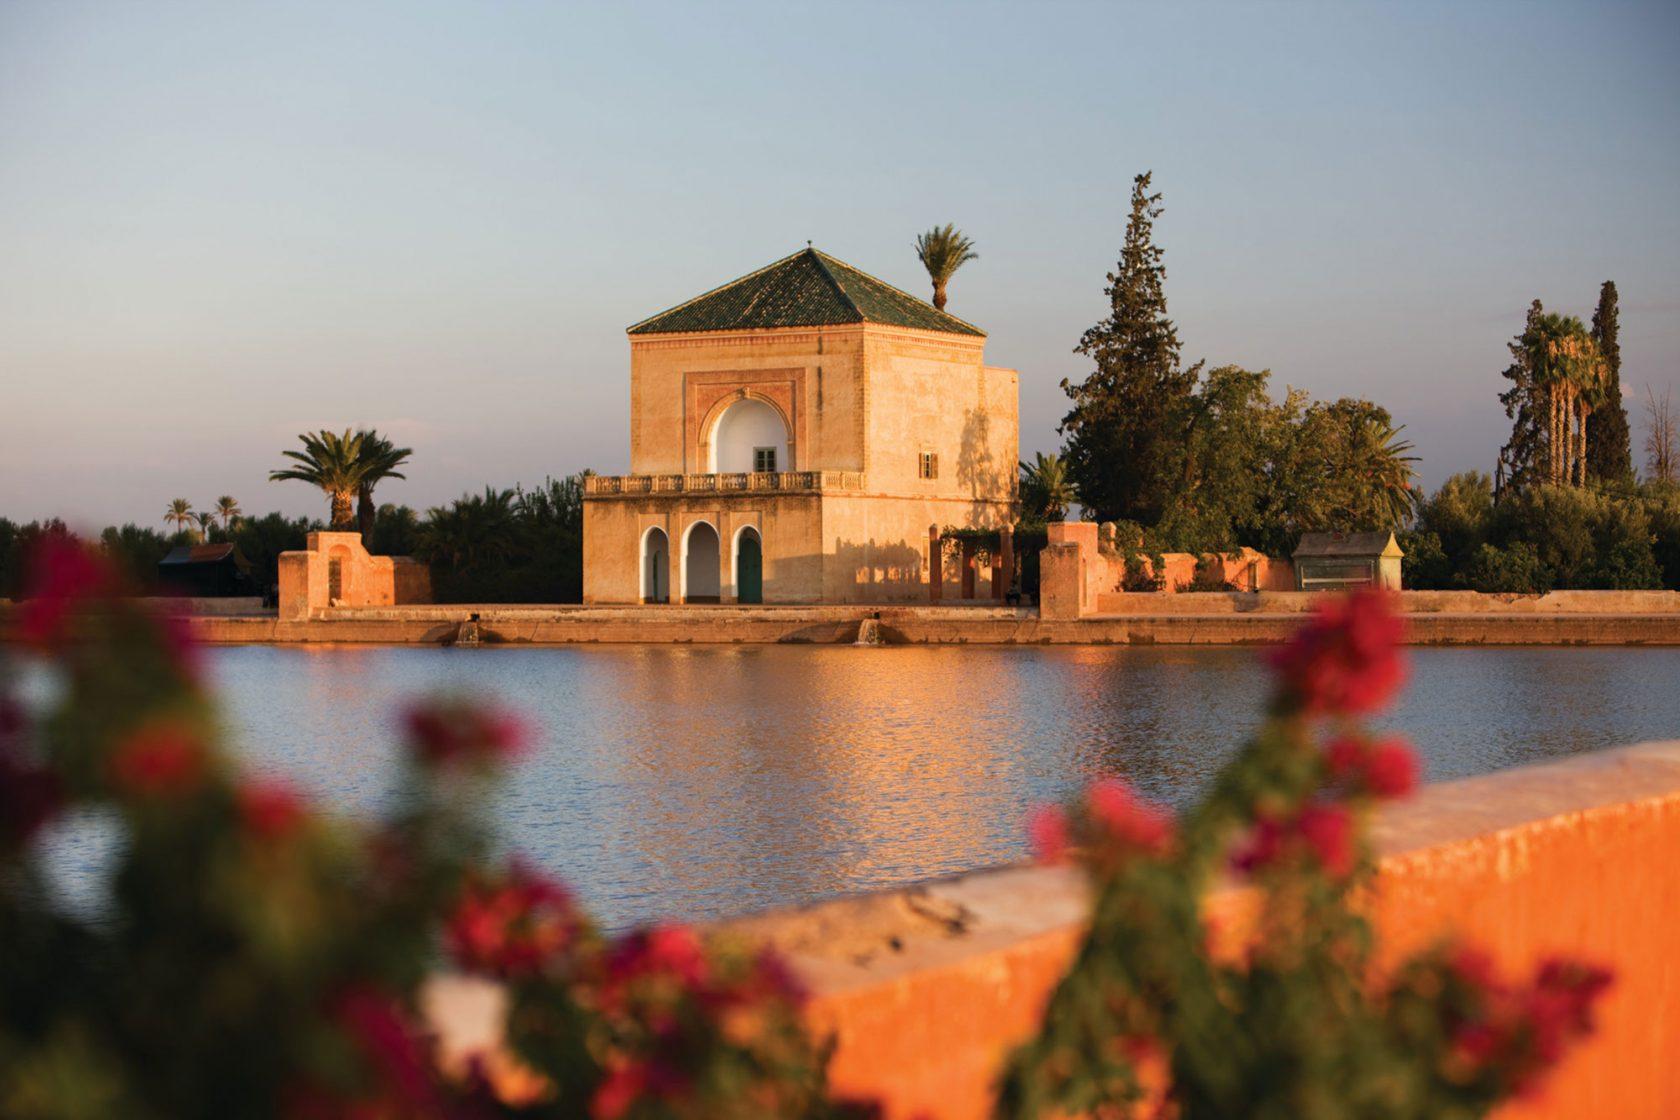 Four Seasons Marrakesch The Menara Gardens